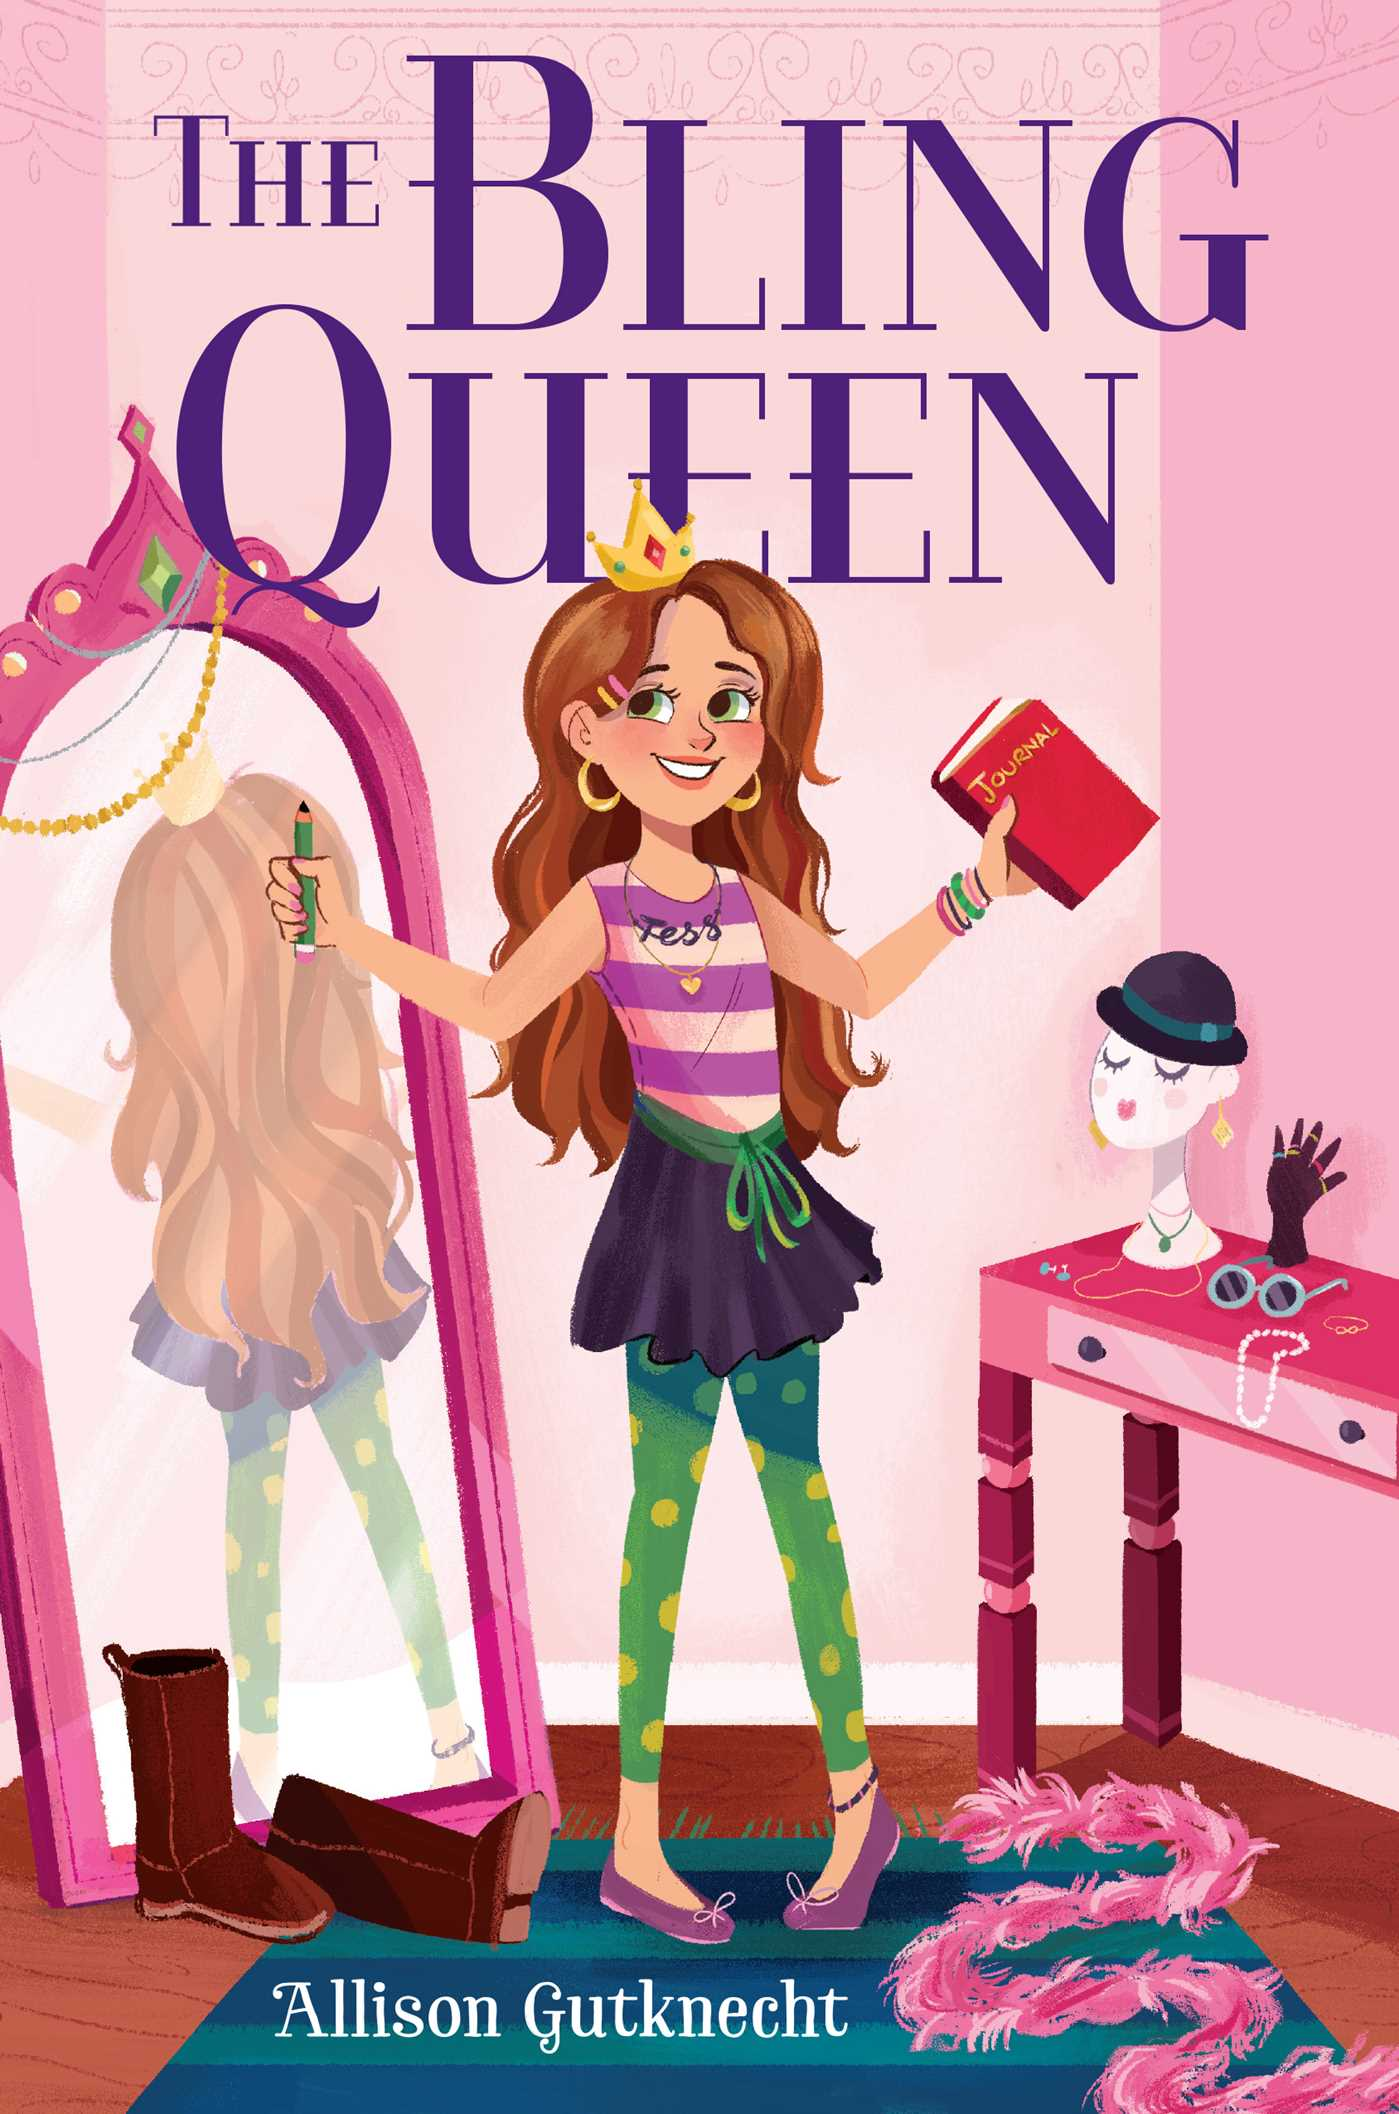 The bling queen 9781481453097 hr